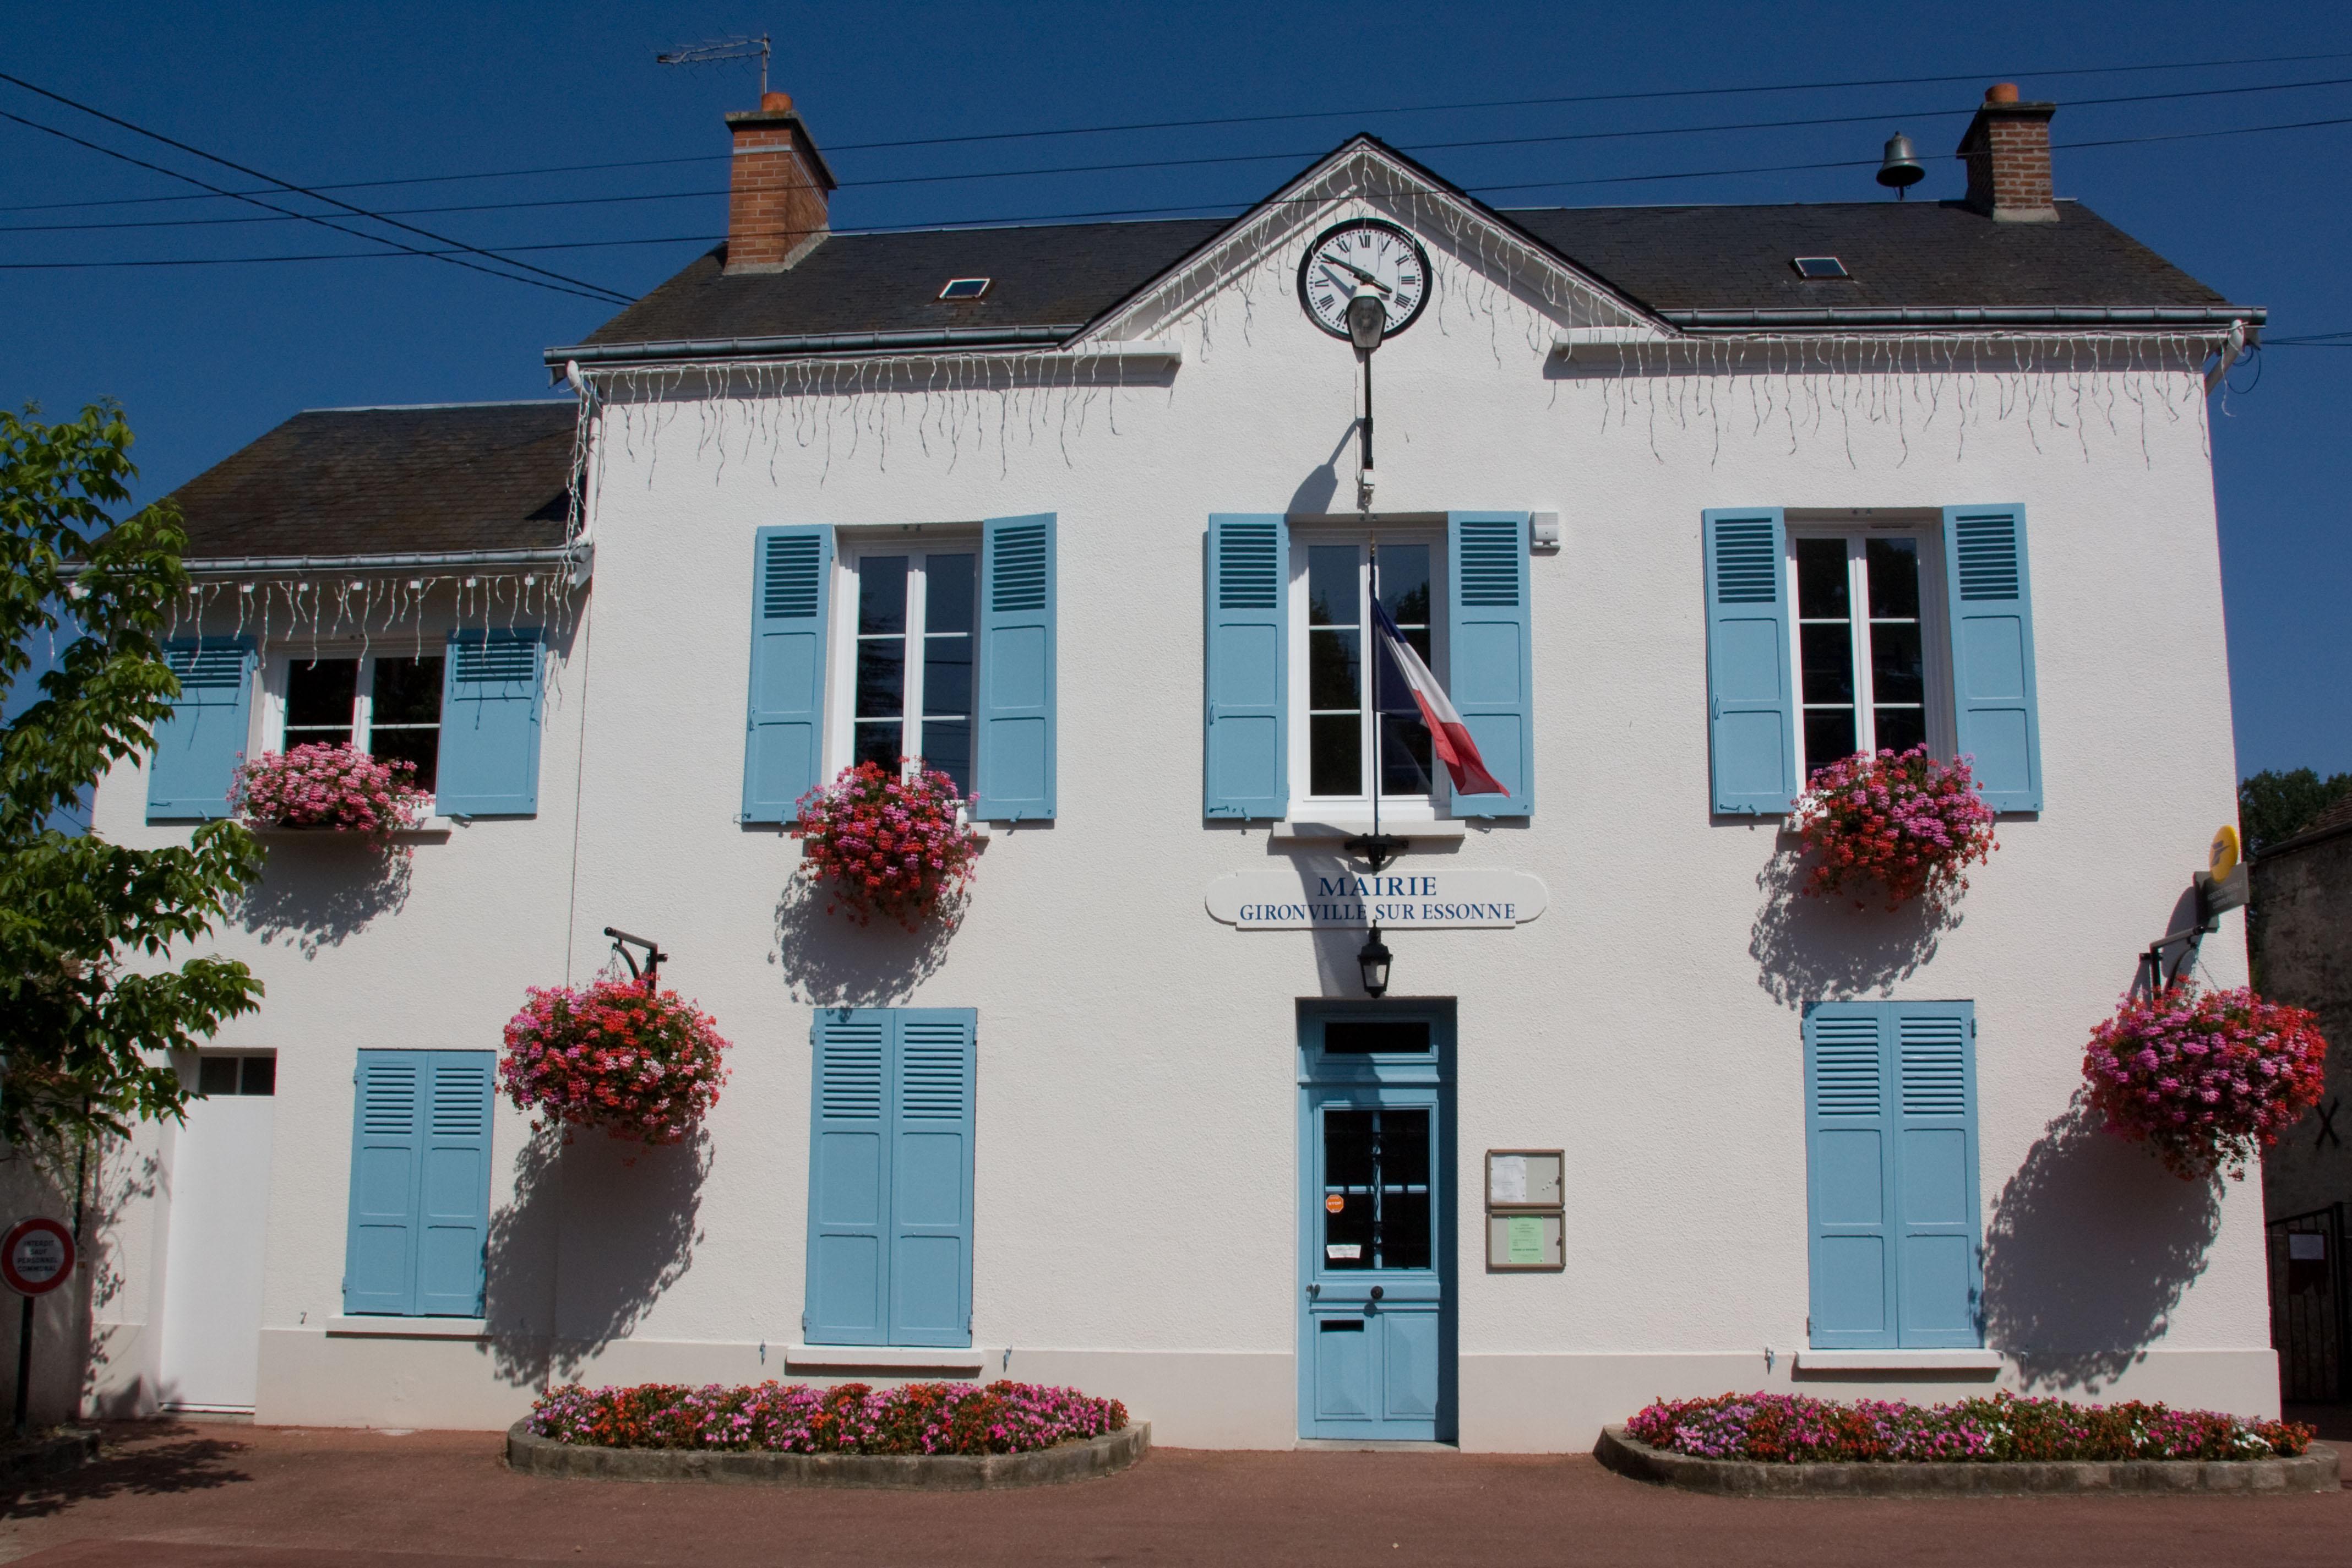 Gironville-sur-Essonne